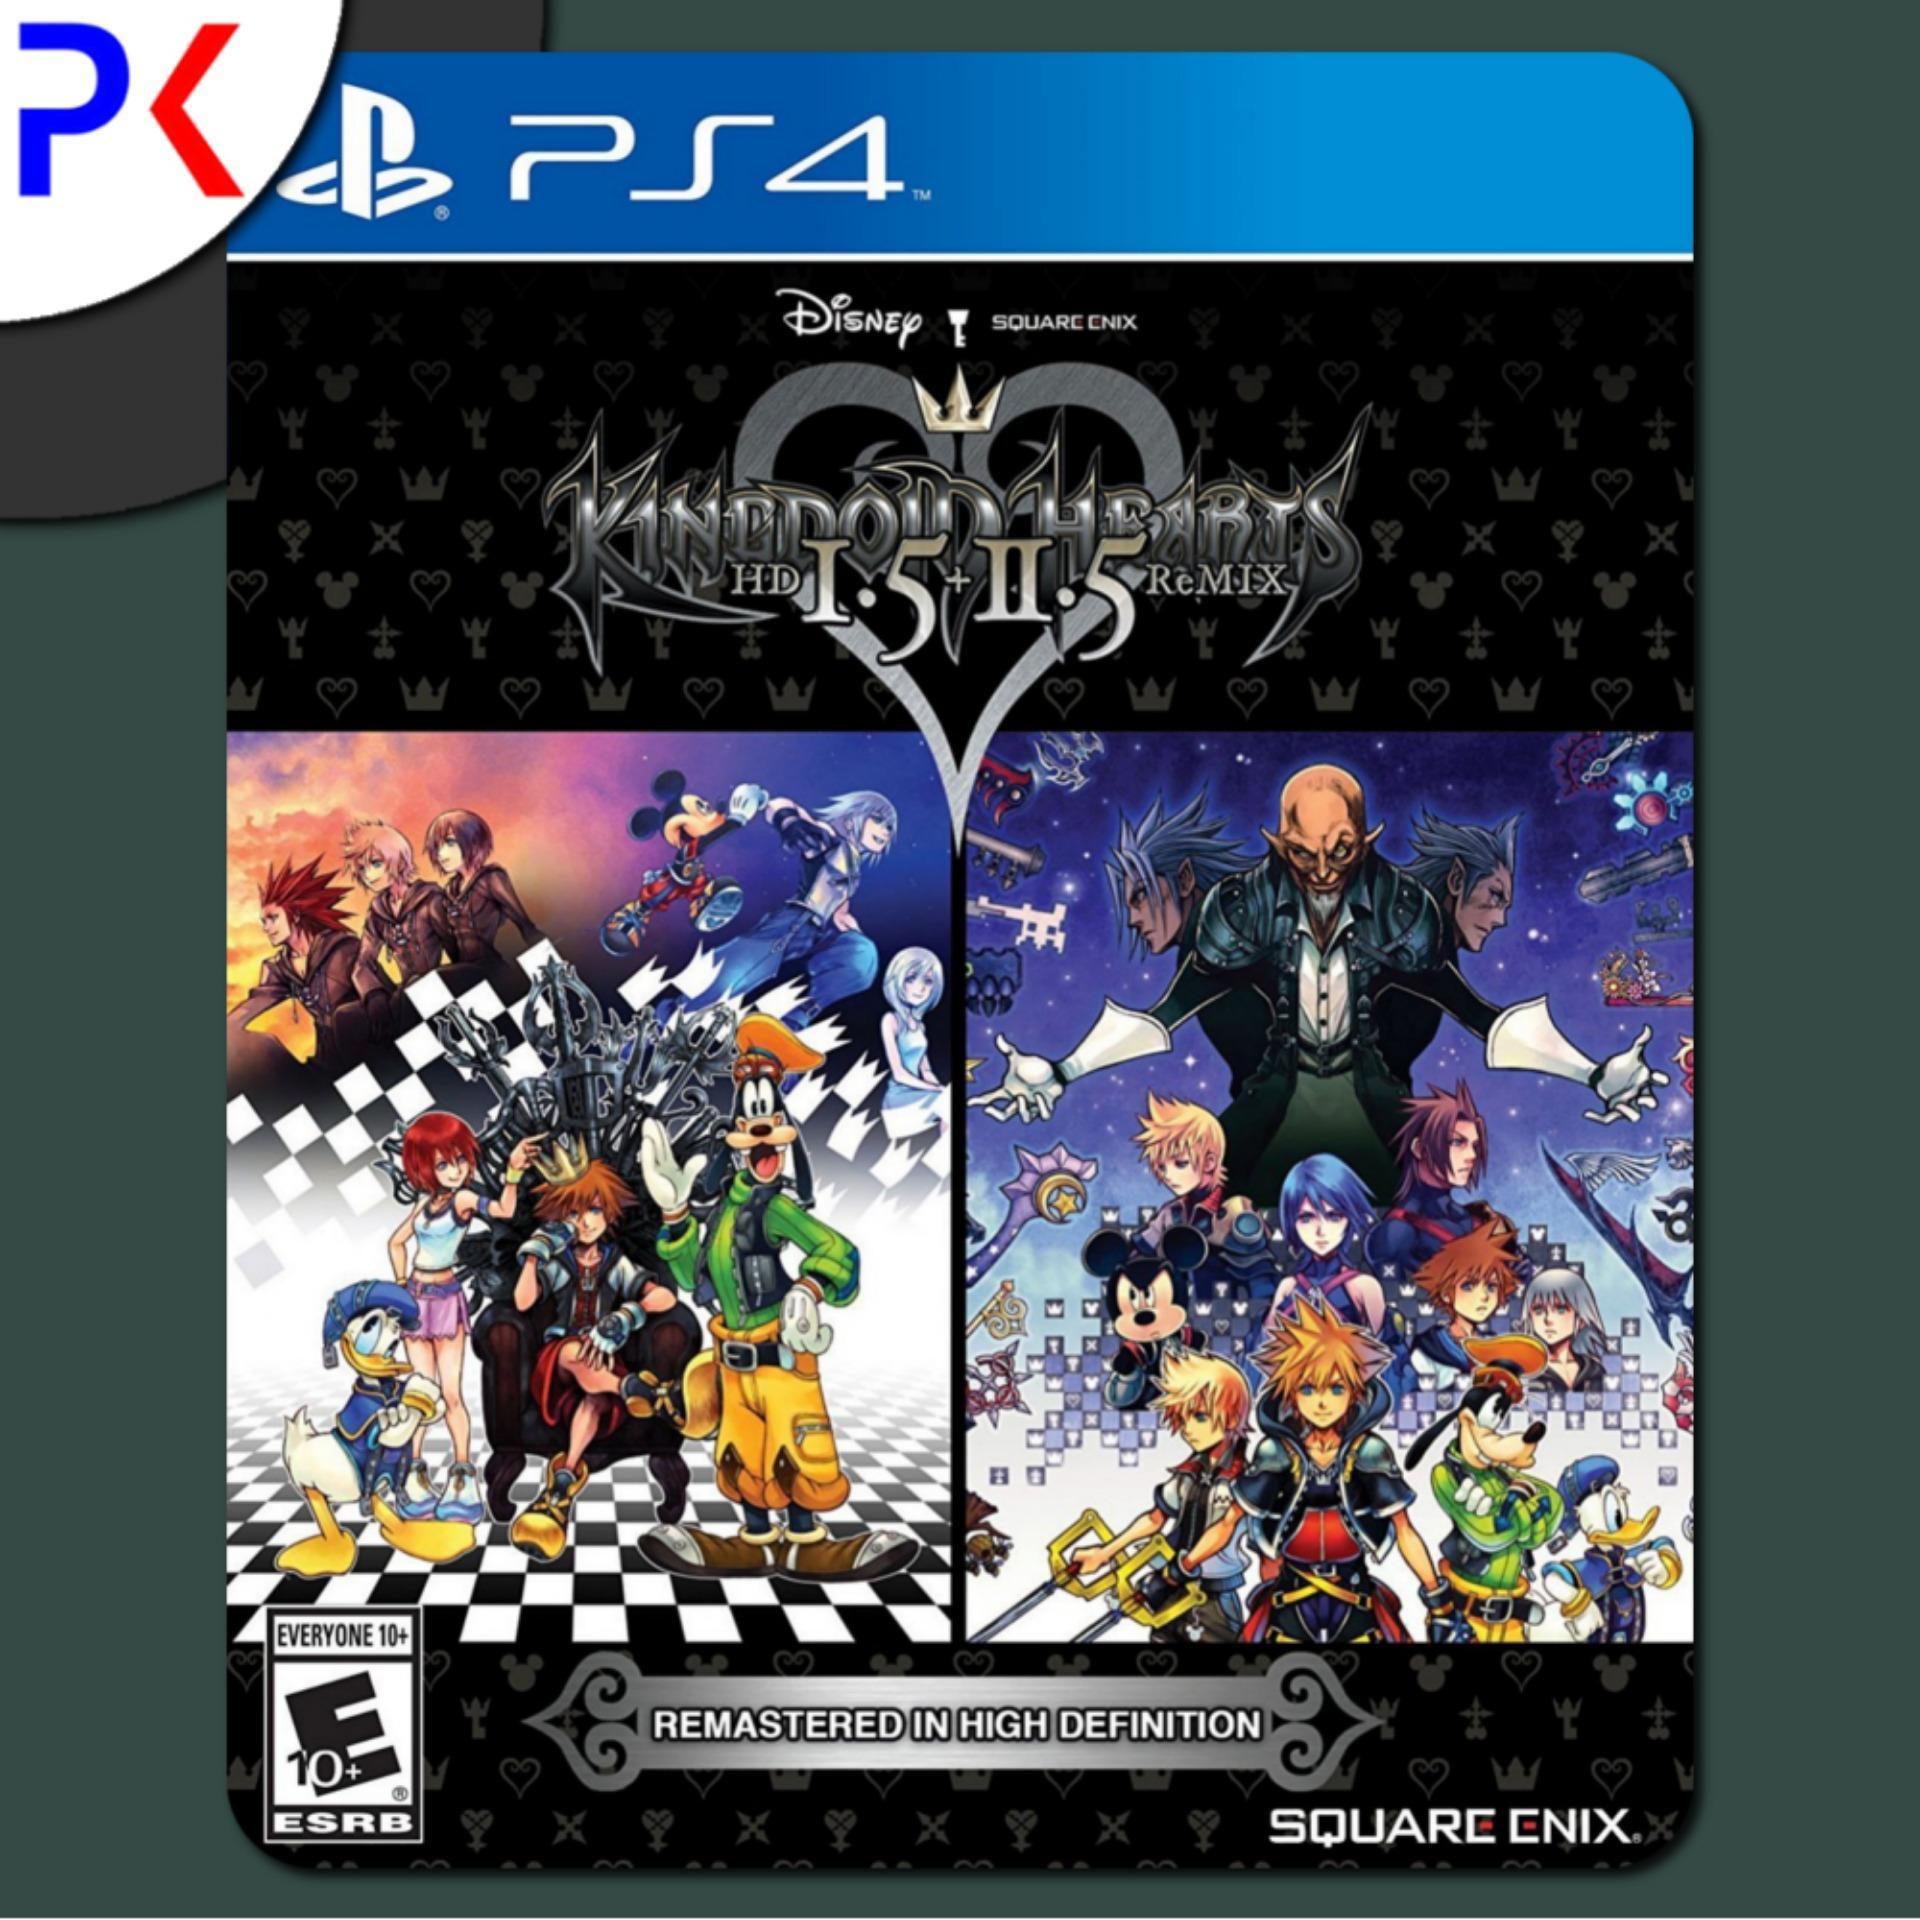 Buy Online Psp Games Best Sellers Lazada Kaset Bd Game Ps4 Dirt Rally Reg 2 Kingdom Hearts Hd I5 Ii5 Remix R1